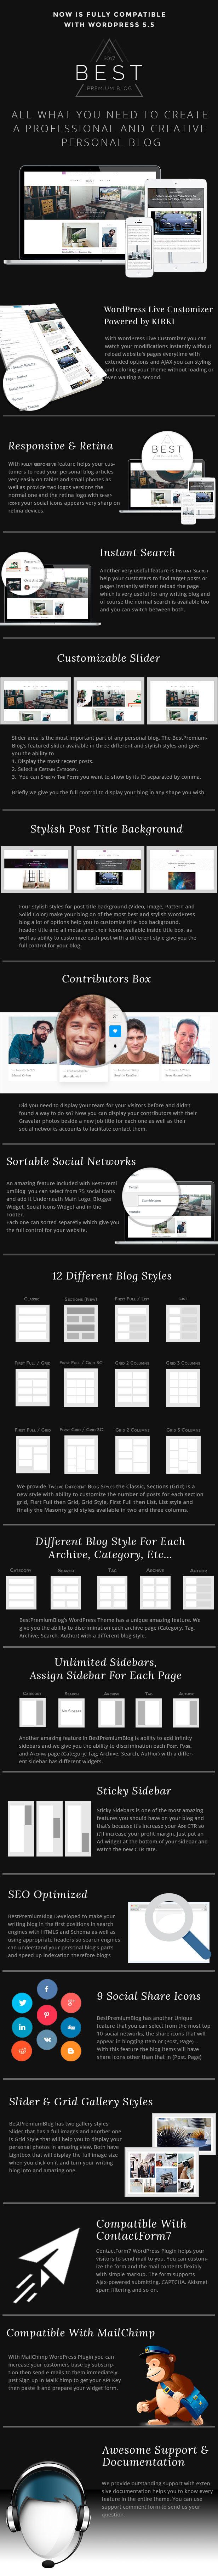 best-premium-blog-writing-write-reading-